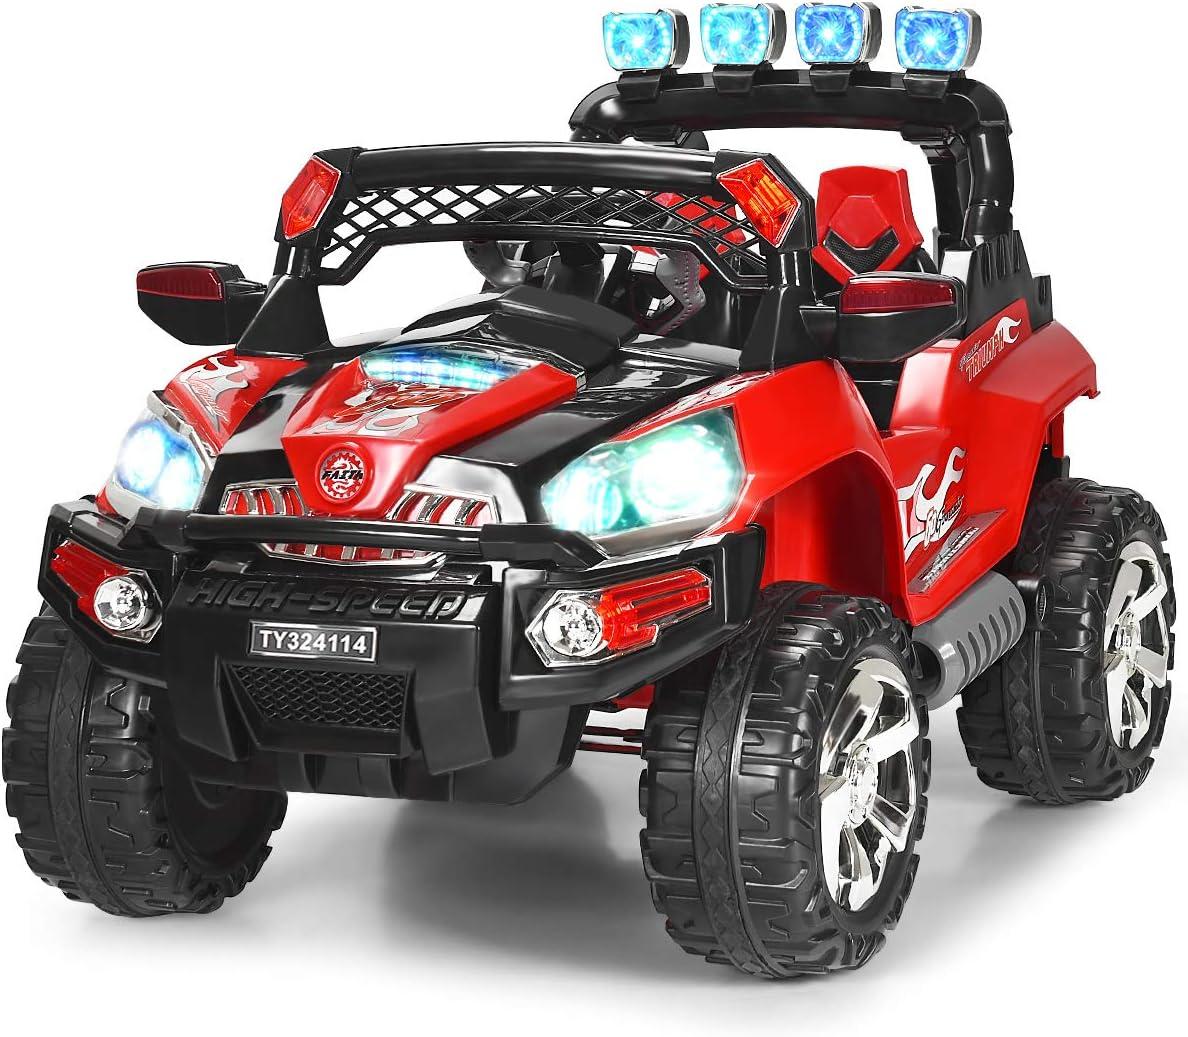 Top 13 Best Kids ATVs (2020 Reviews & Buying Guide) 13